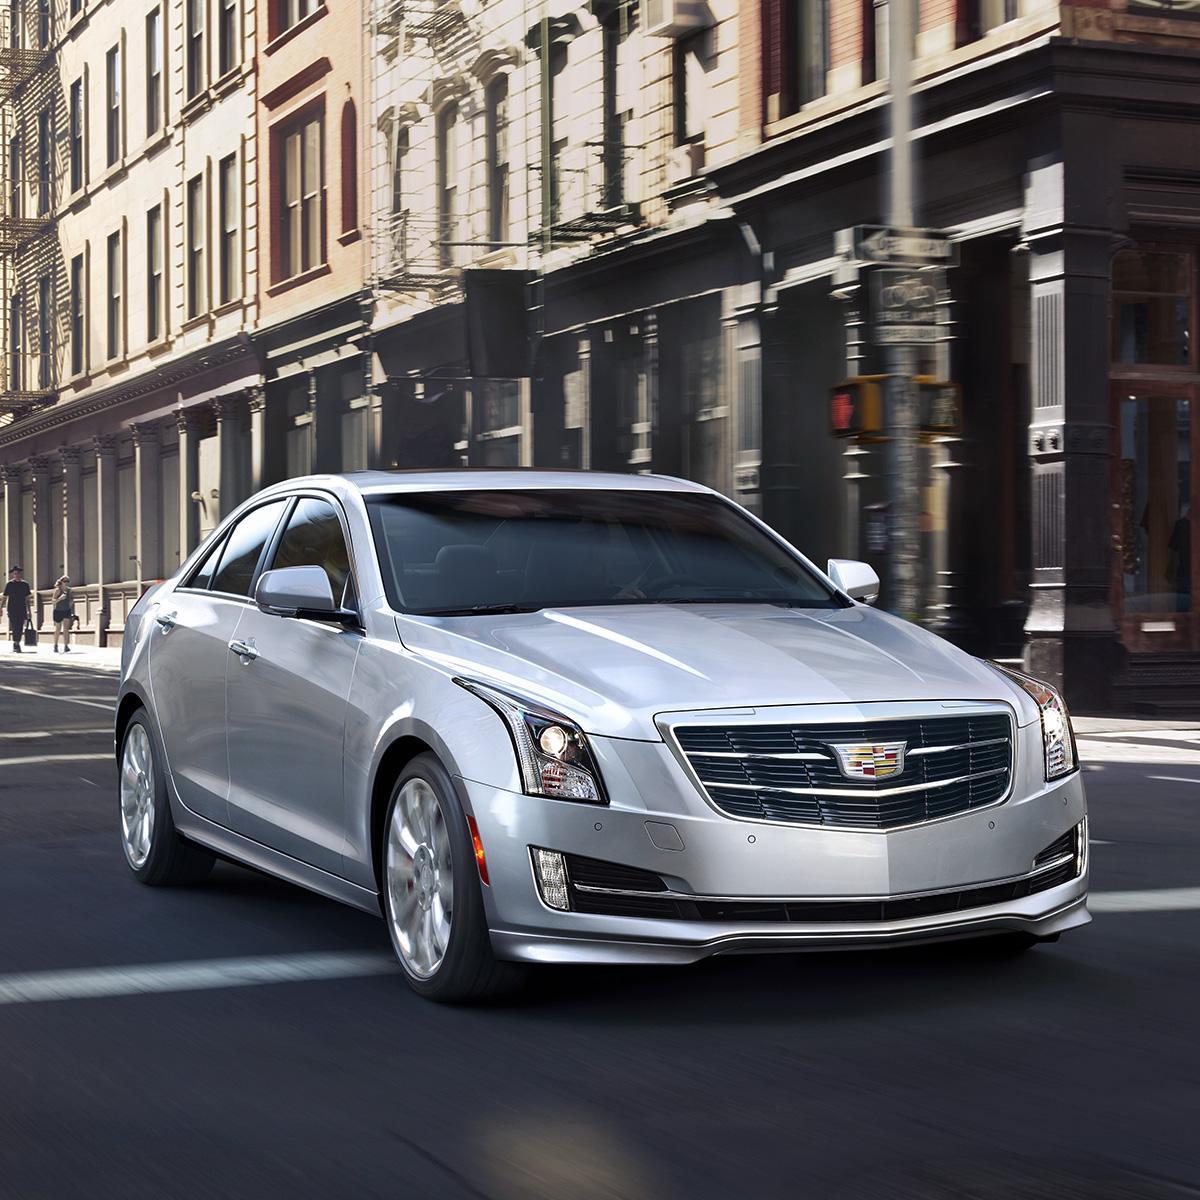 "Cadillac México on Twitter: ""Cadillac #ATS Sedán se supera ..."